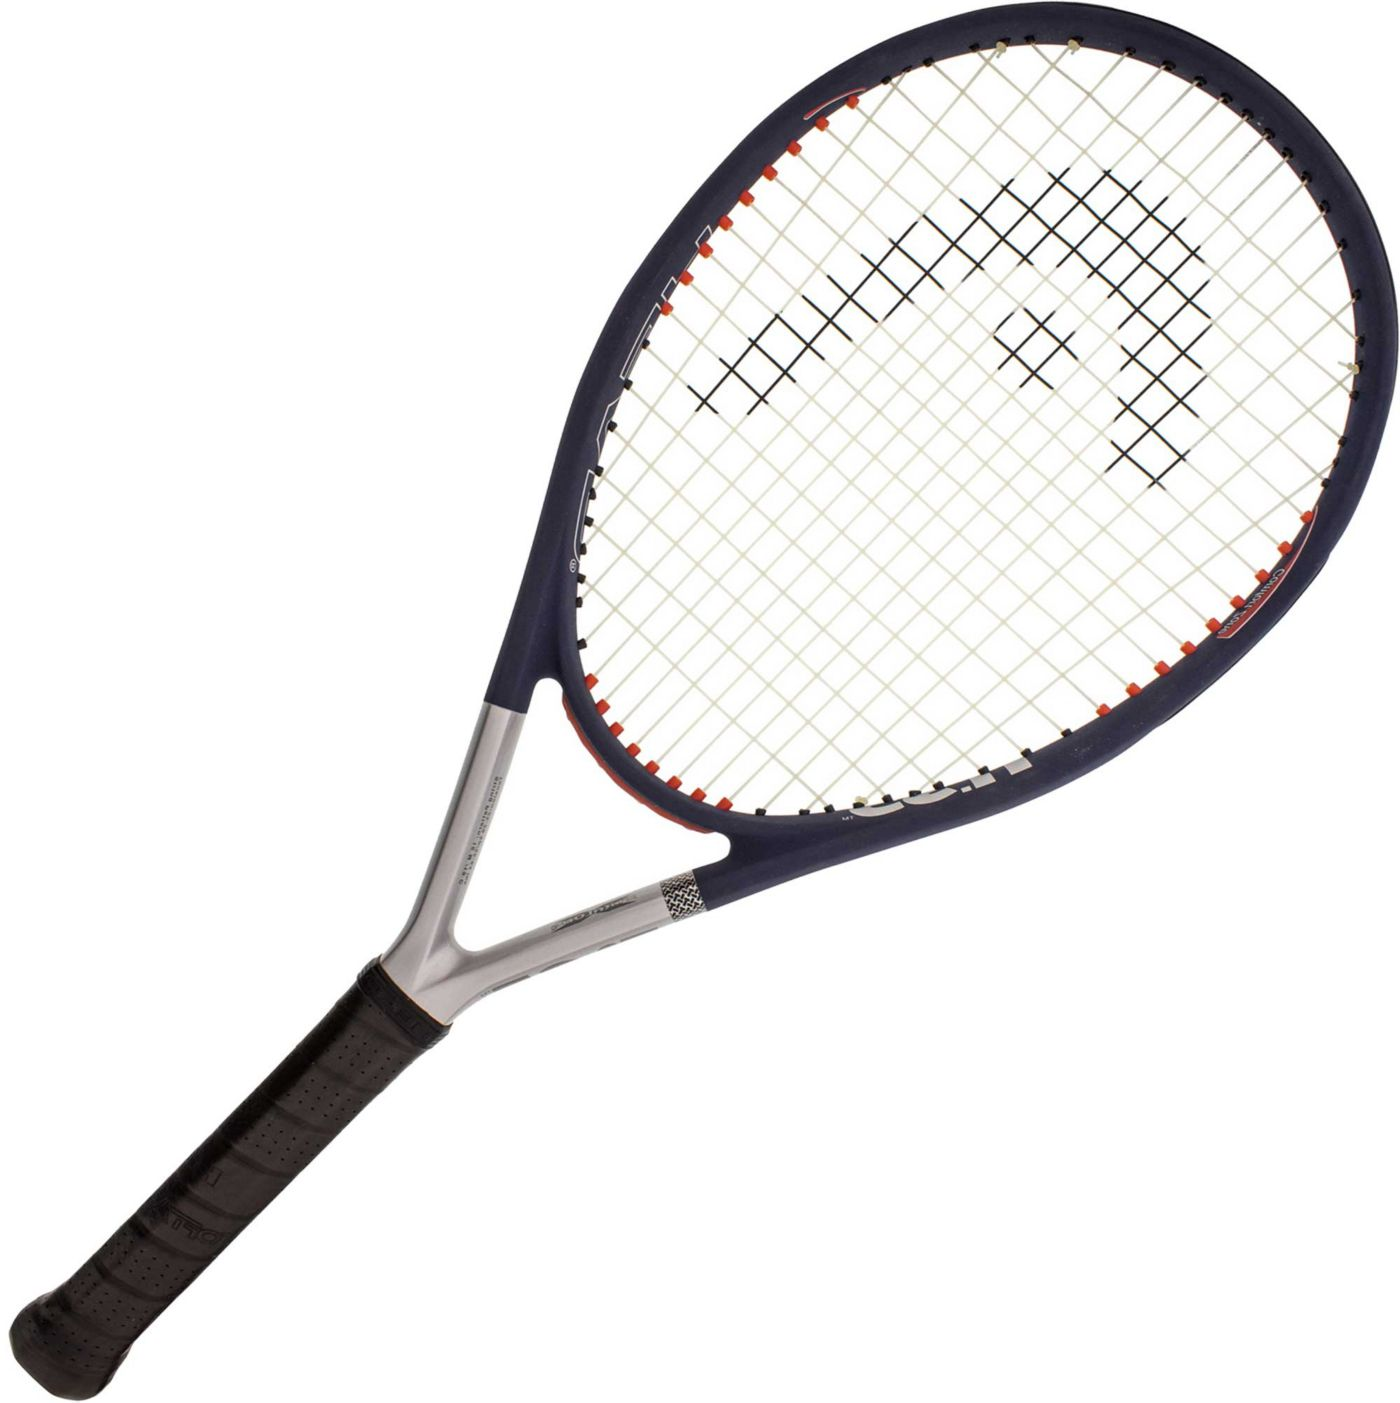 Head TiS5 Tennis Racquet